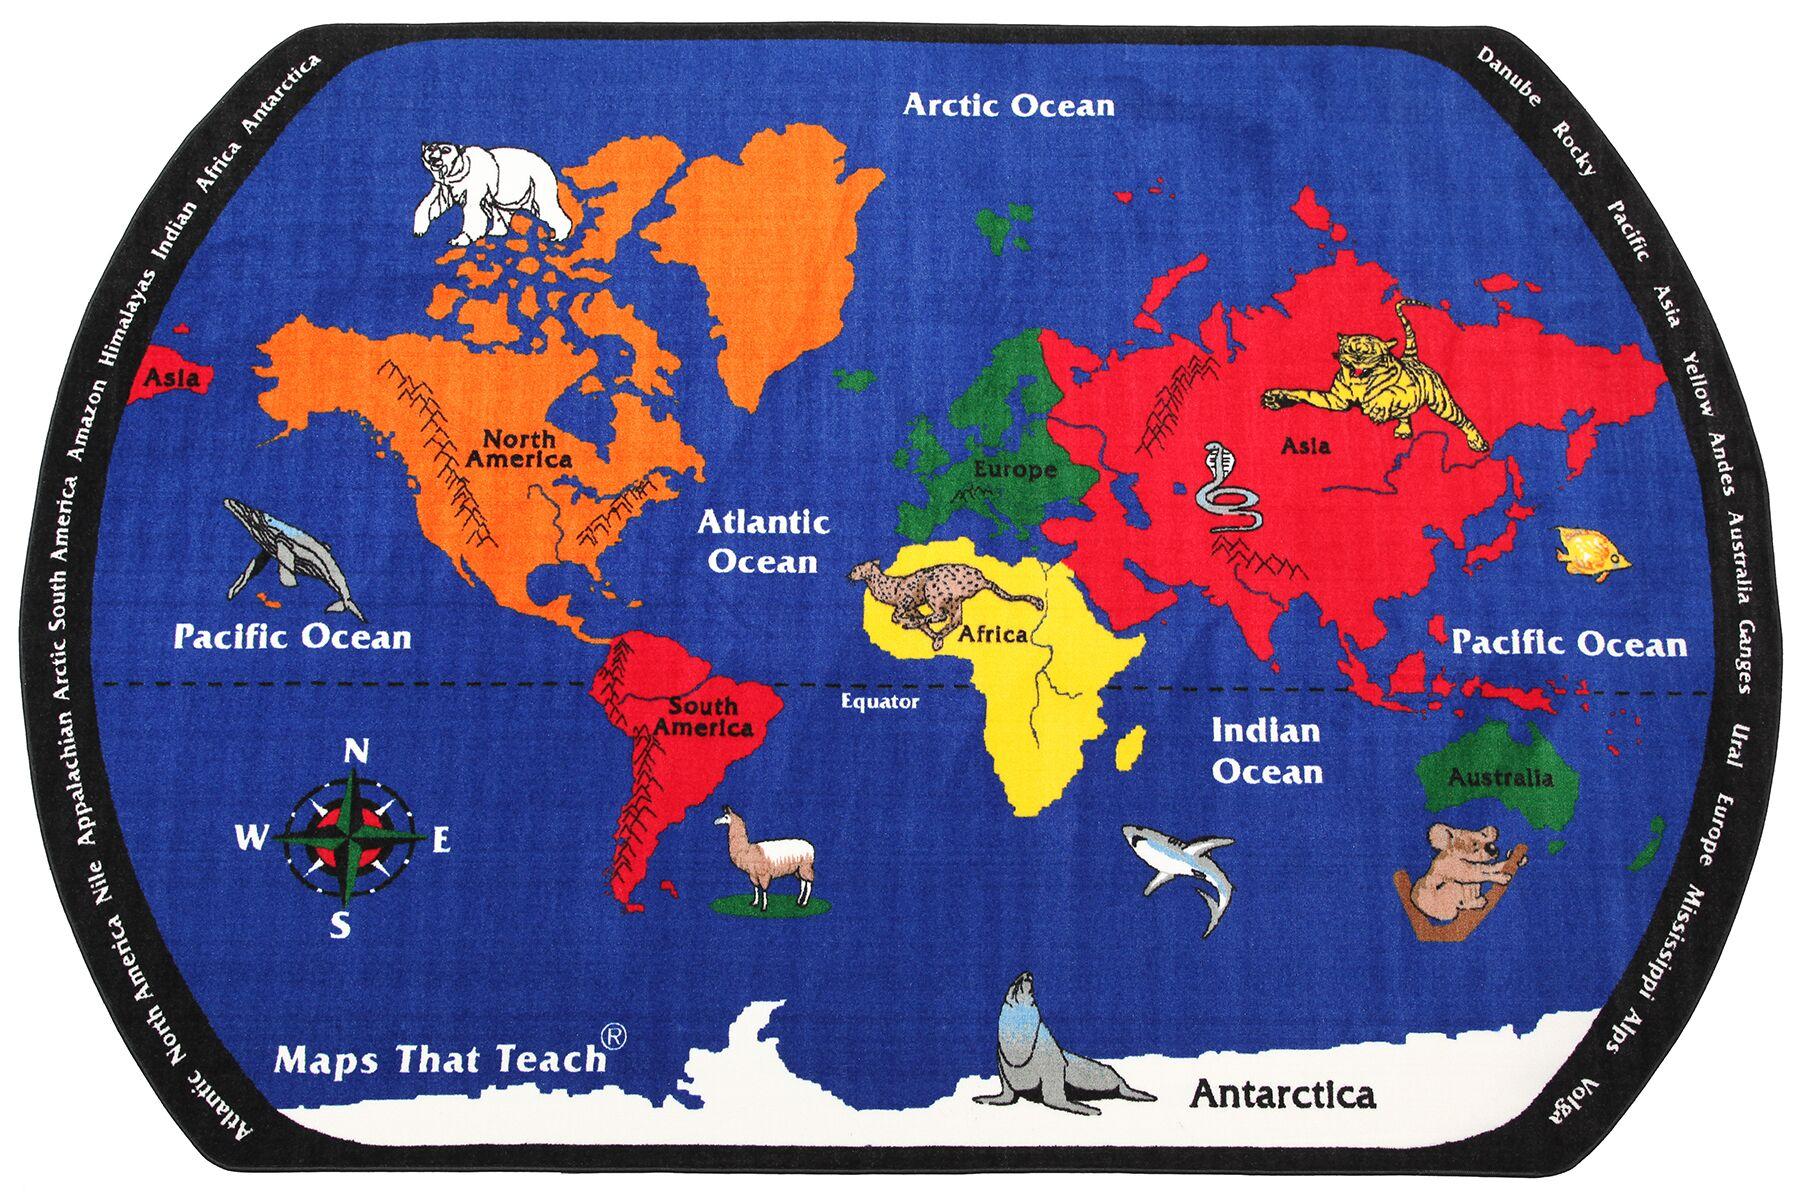 Maps That Teach Kids Rug Rug Size: 6' x 9'